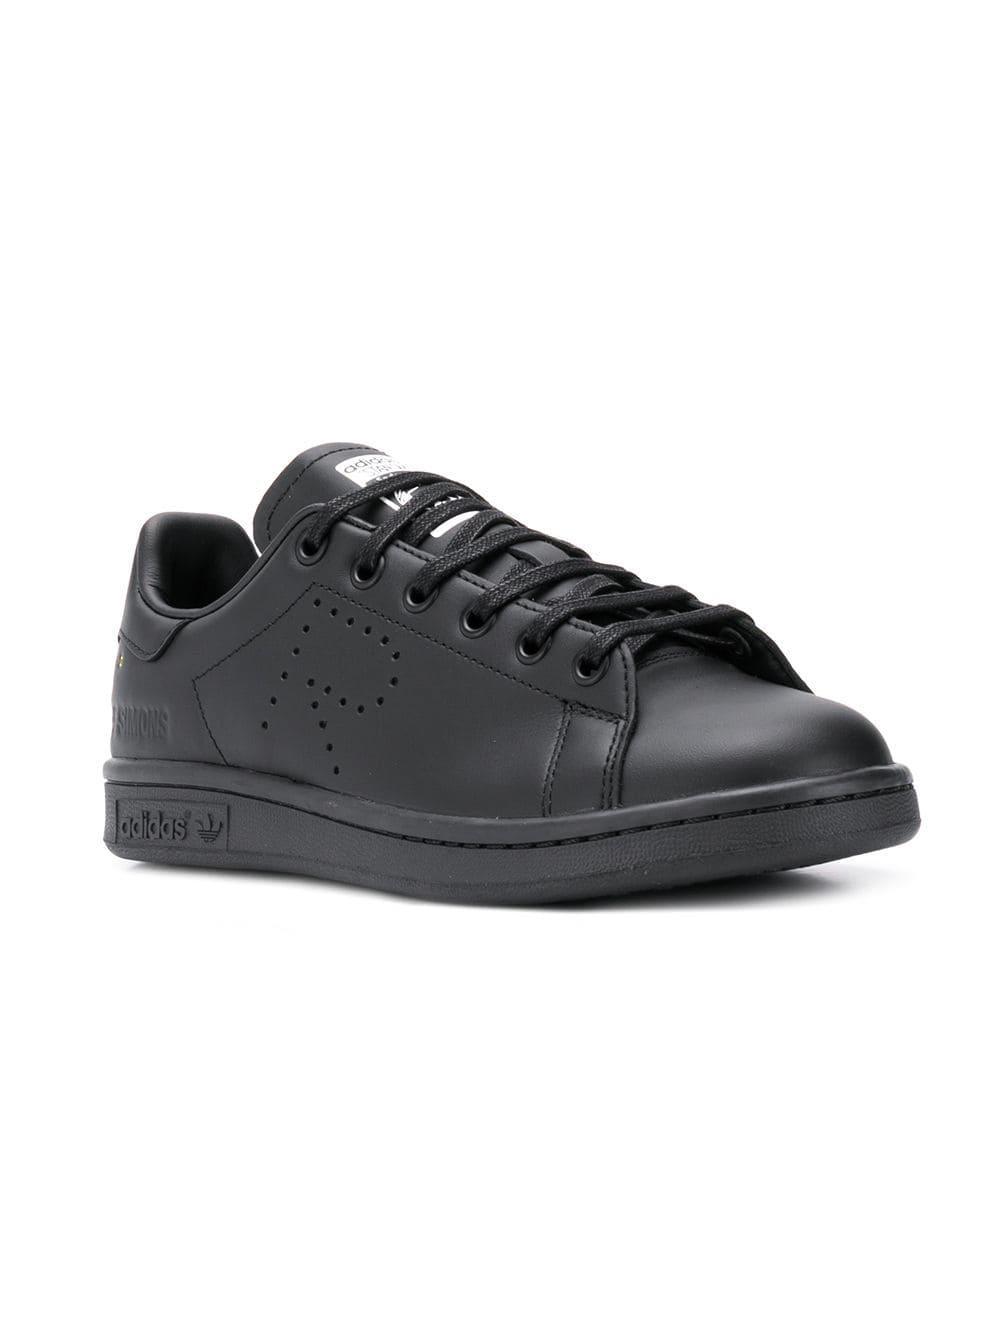 buy popular ce749 3e92e Adidas By Raf Simons - Black Stan Smith Trainers - Lyst. View fullscreen